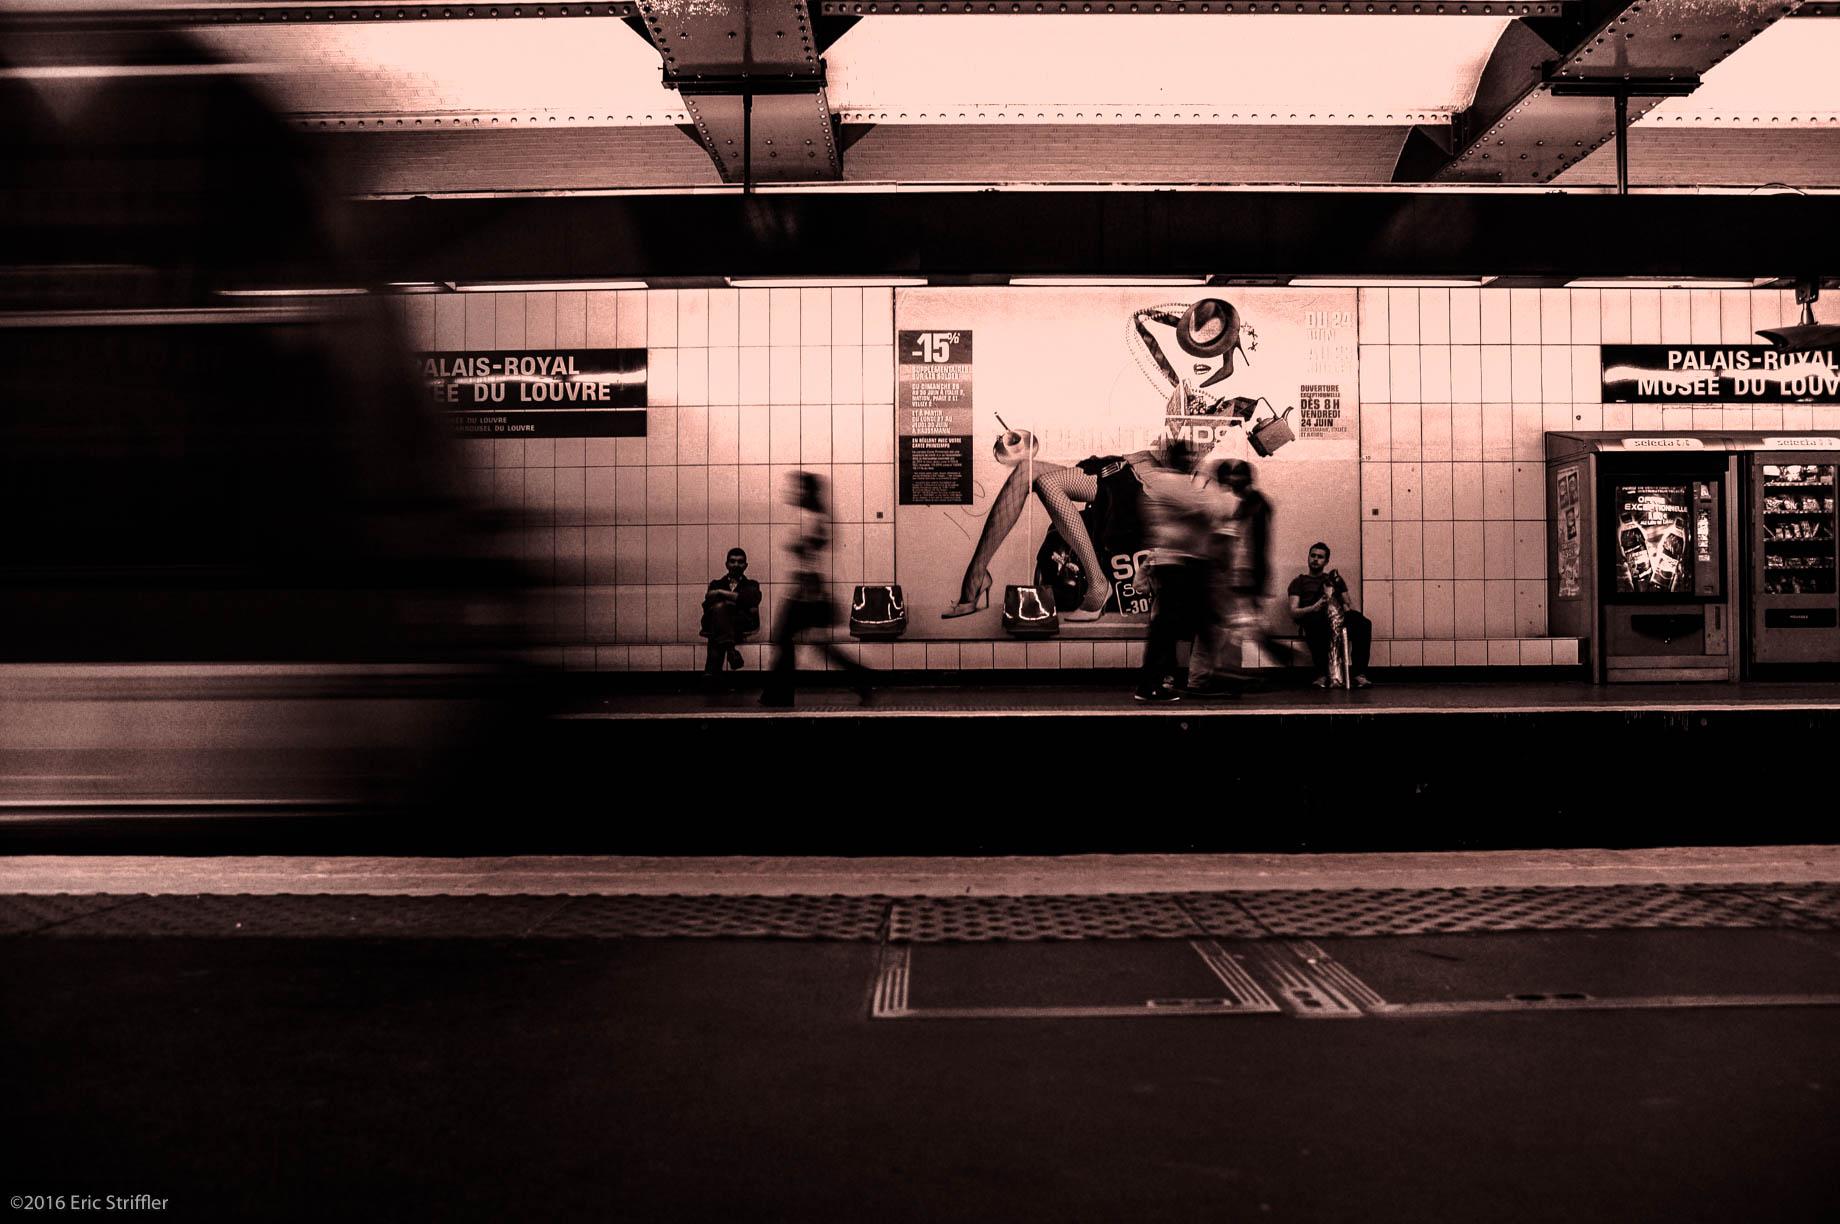 eric_striffler_photography_travel-67.jpg